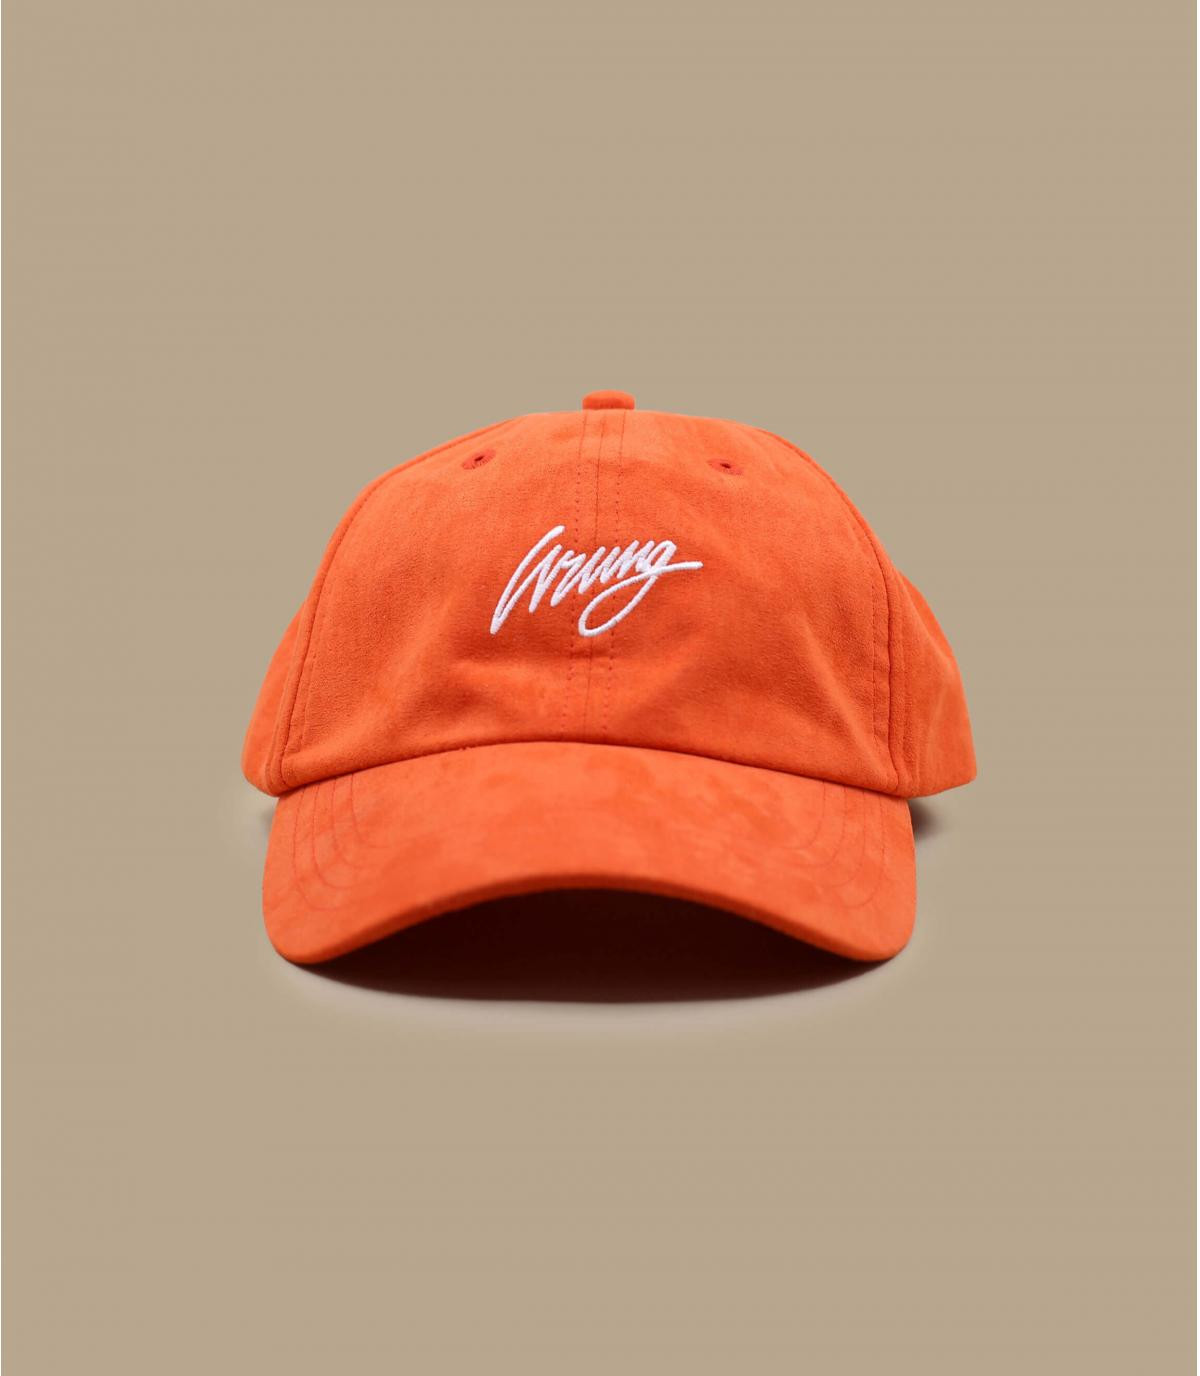 Details Sign Ball orange - Abbildung 2